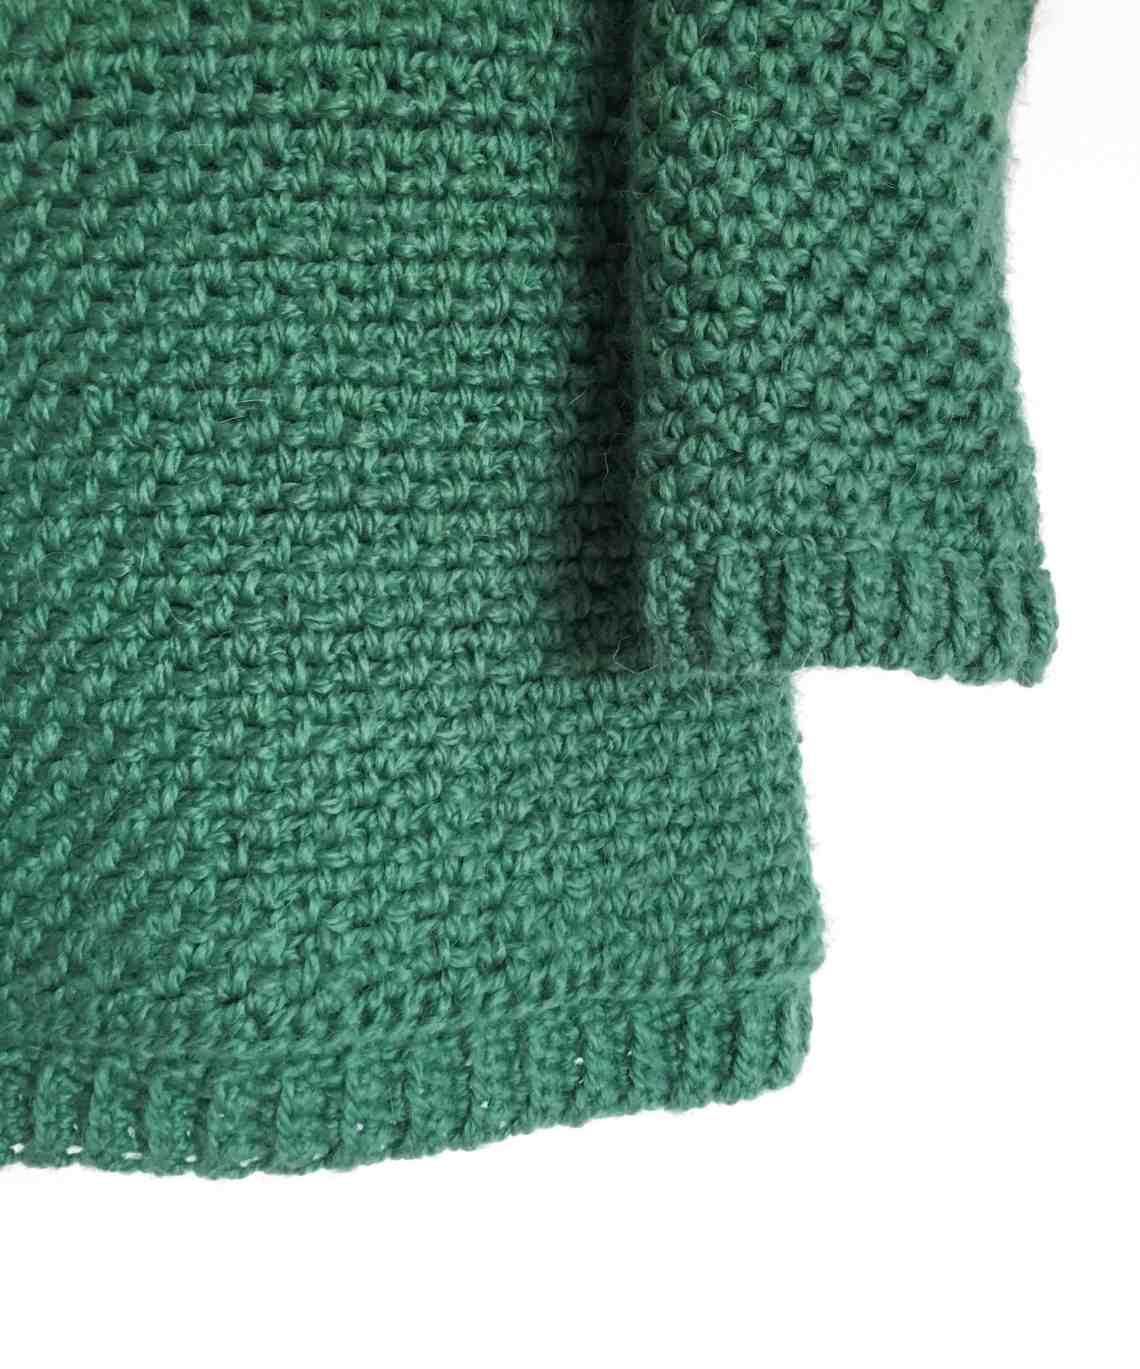 Corner of green crochet moss stitch sweater hanging on white wall